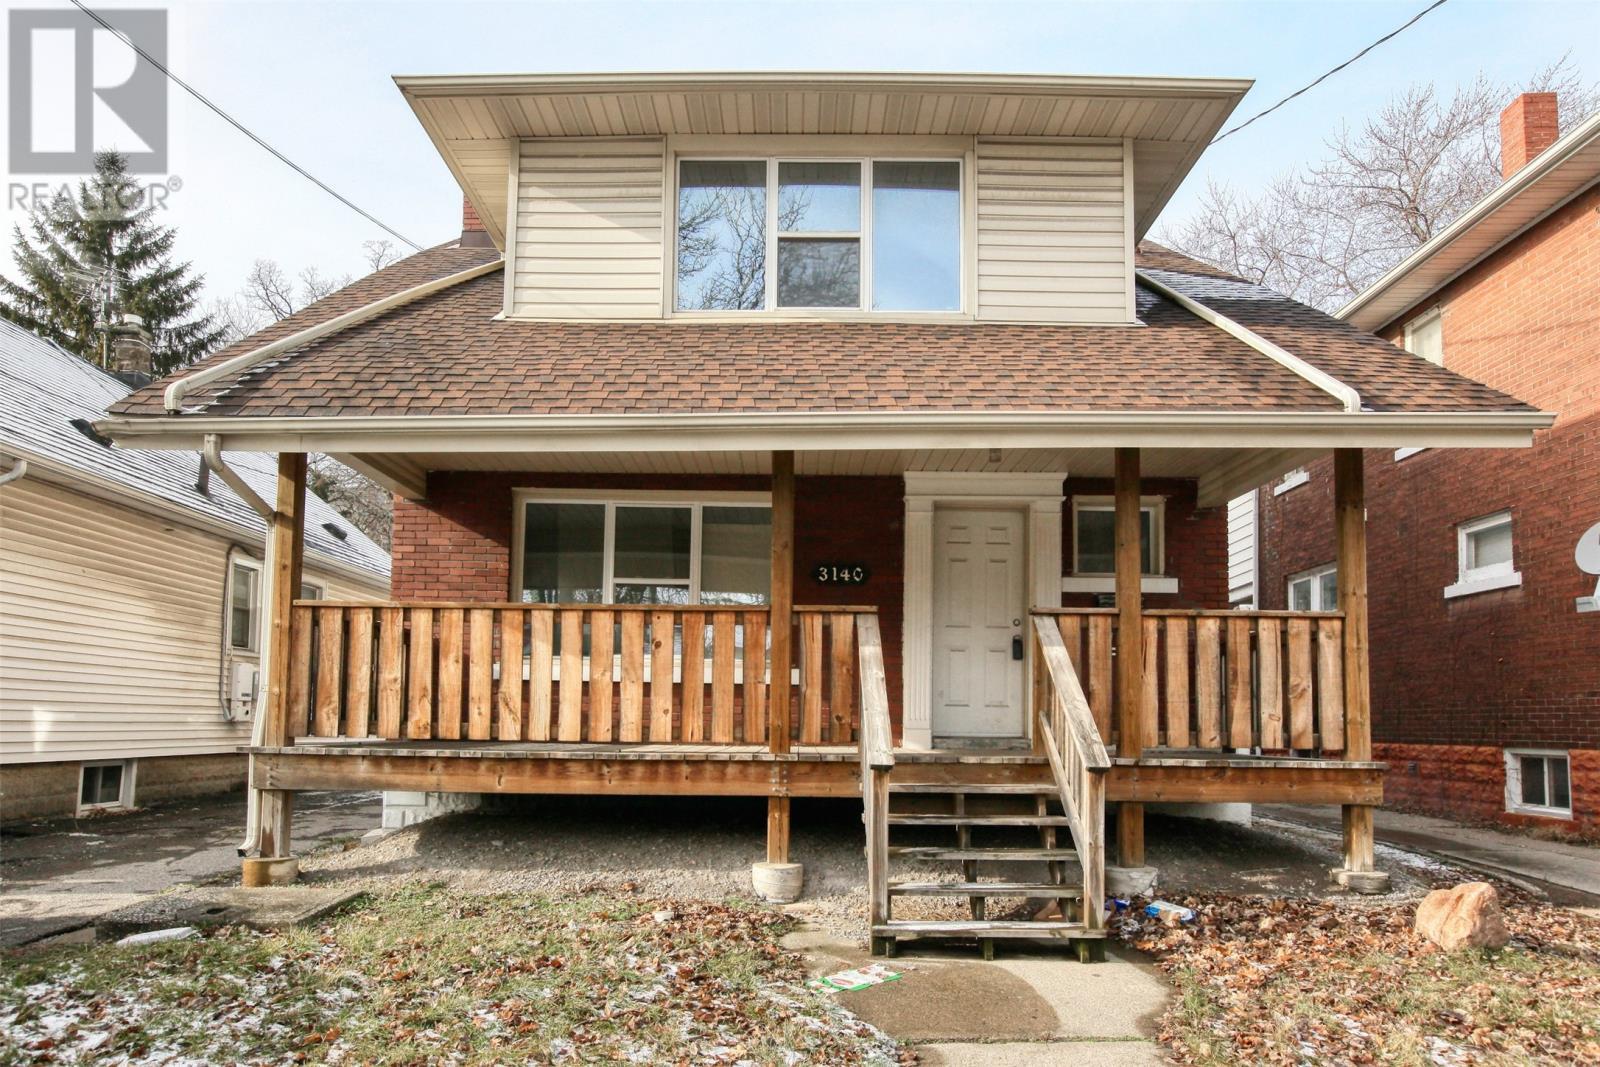 Removed: 3140 Wyandotte Street West, Windsor, ON - Removed on 2020-01-21 23:45:11